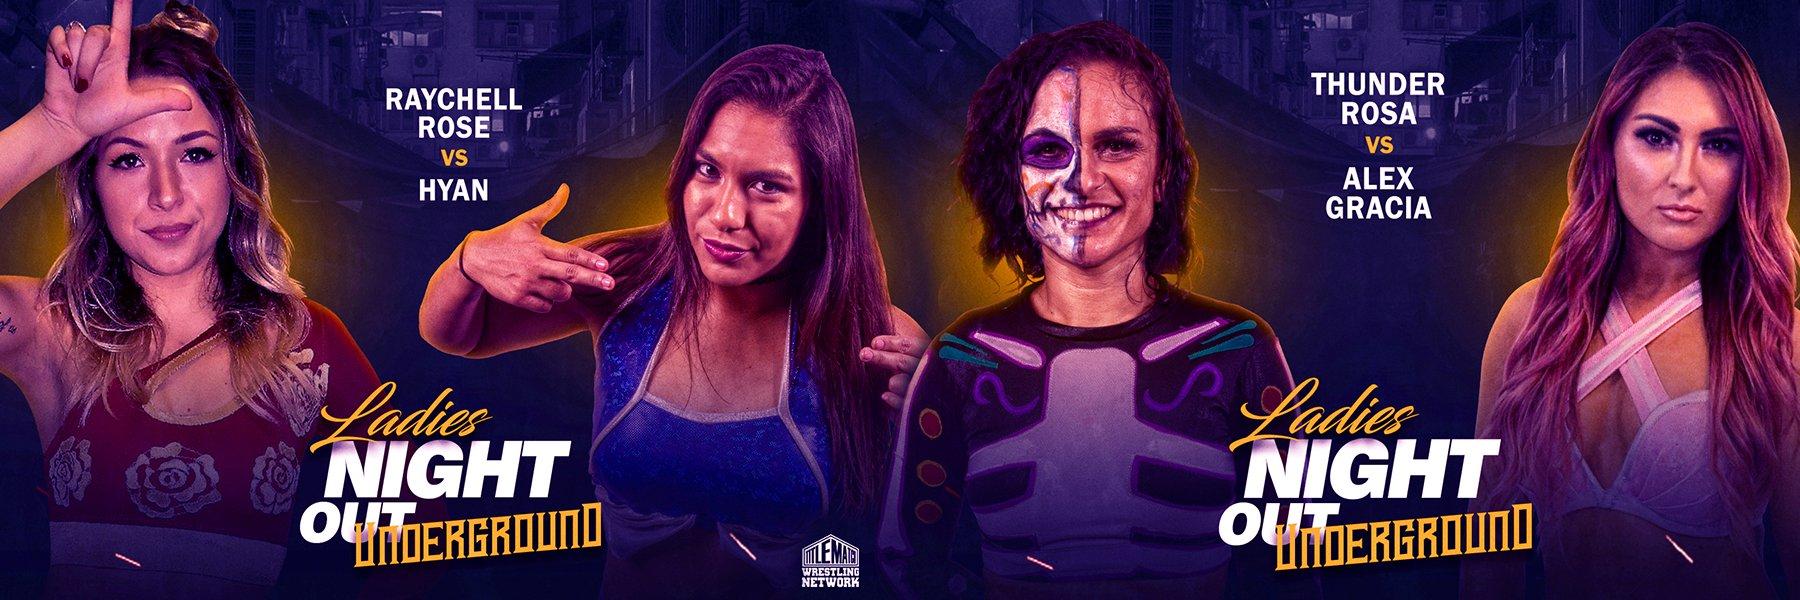 STREAM Ladies Night Out: Underground Ep1 - Thunder Rosa vs Alex Gracia